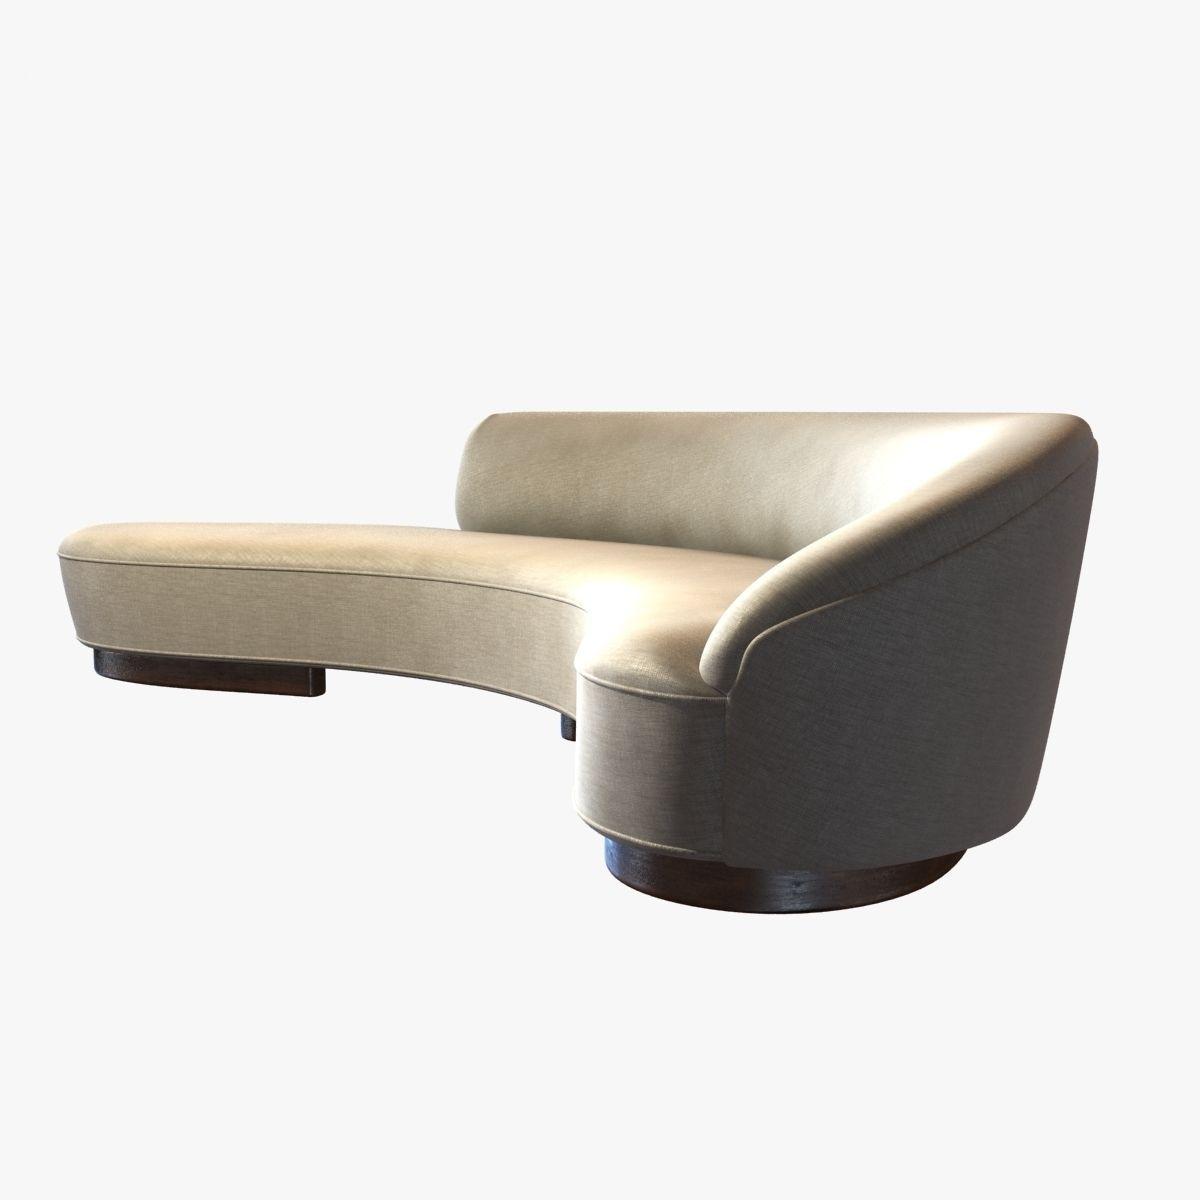 Superieur ... Vladimir Kagan Freeform Curved Sofa With Arm 3d Model Max Obj 3ds Fbx  Stl Mtl 3 ...